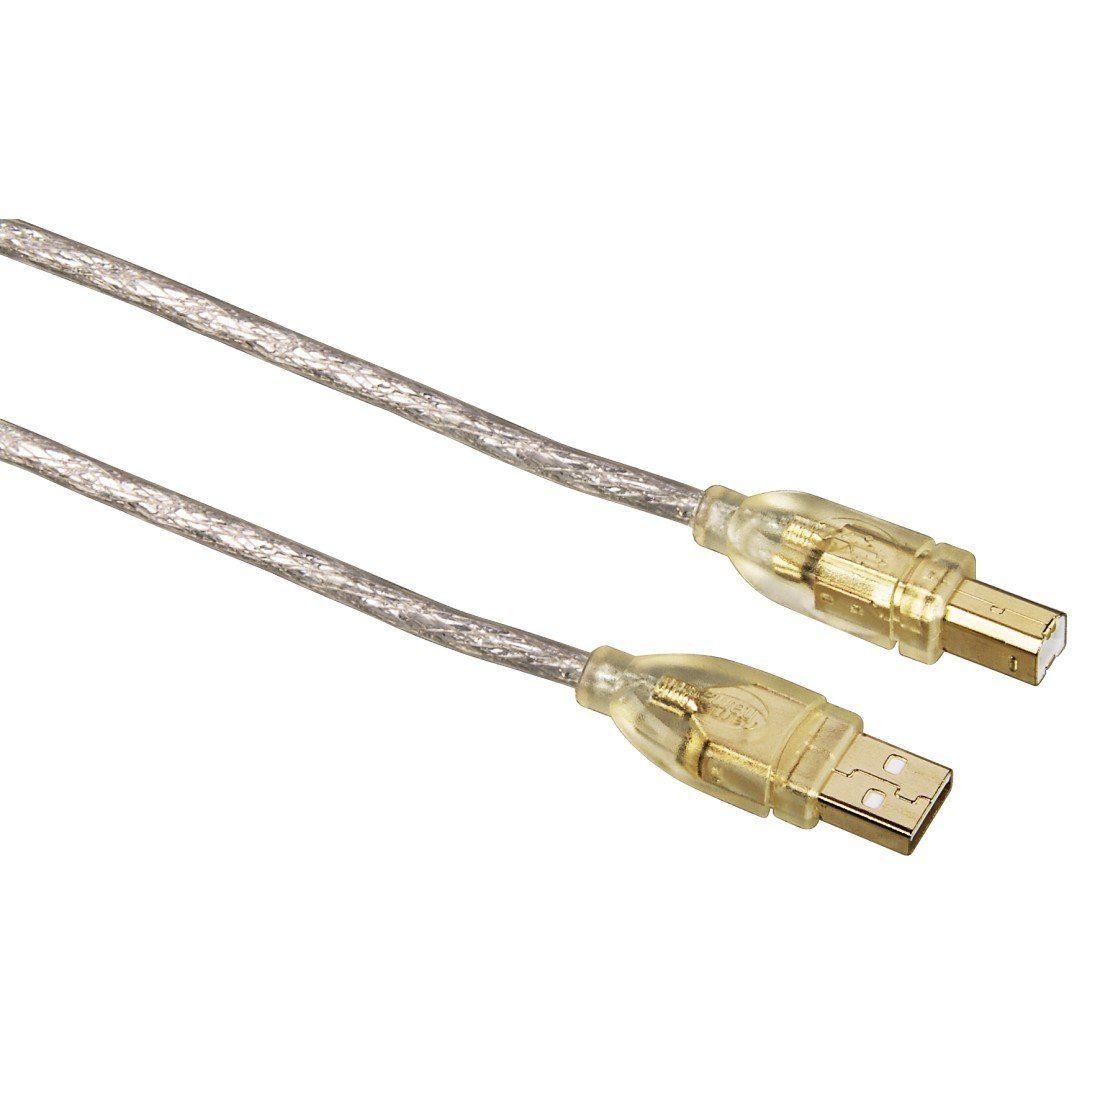 Hama USB-2.0-Kabel, vergoldet, doppelt geschirmt, Transparent, 1,80